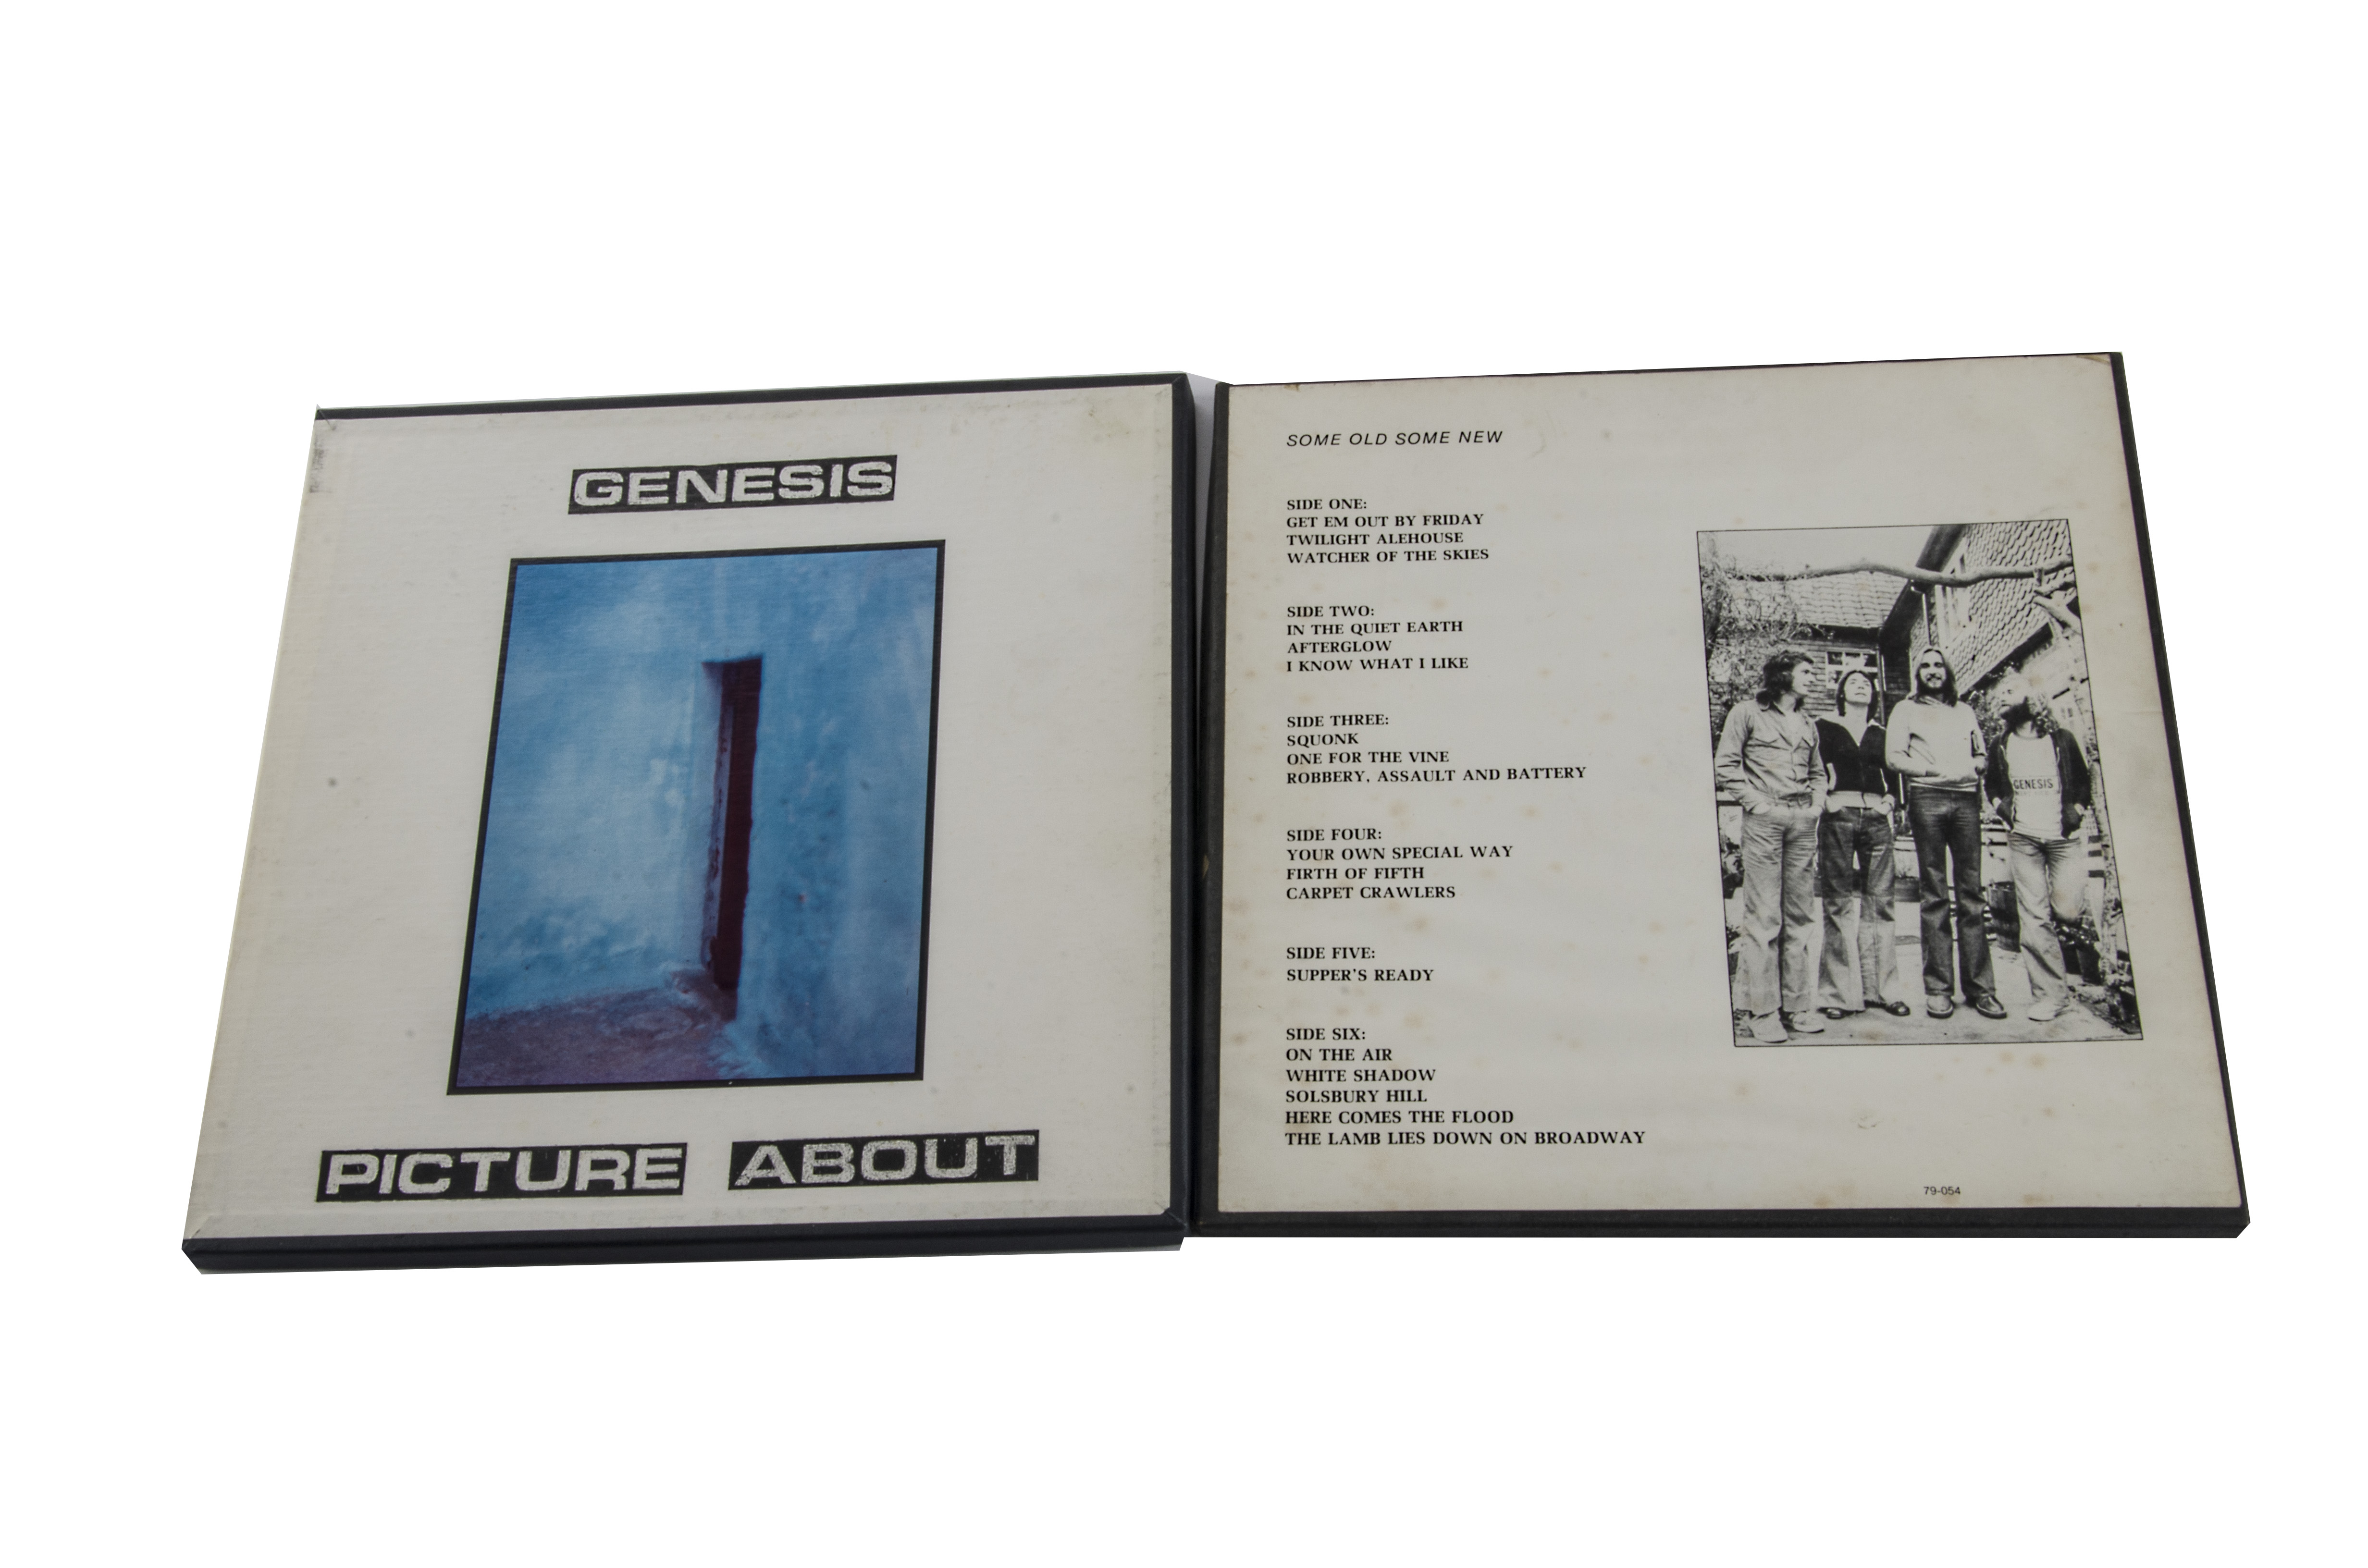 Genesis Box Sets, two triple album box sets comprising